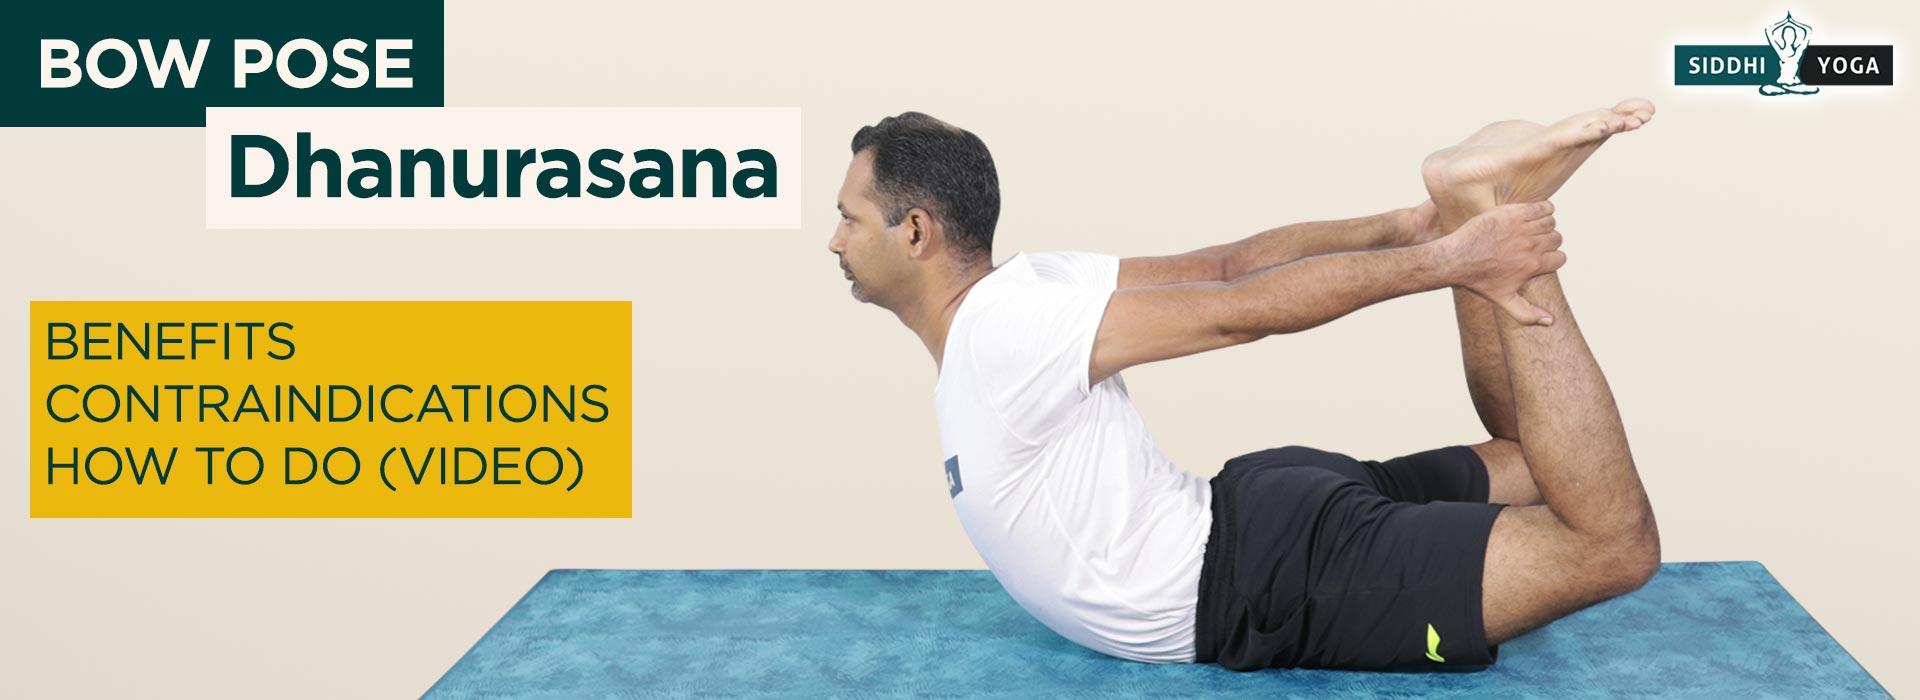 Dhanurasana (Bow Pose) Benefits, How to Do & Contraindications